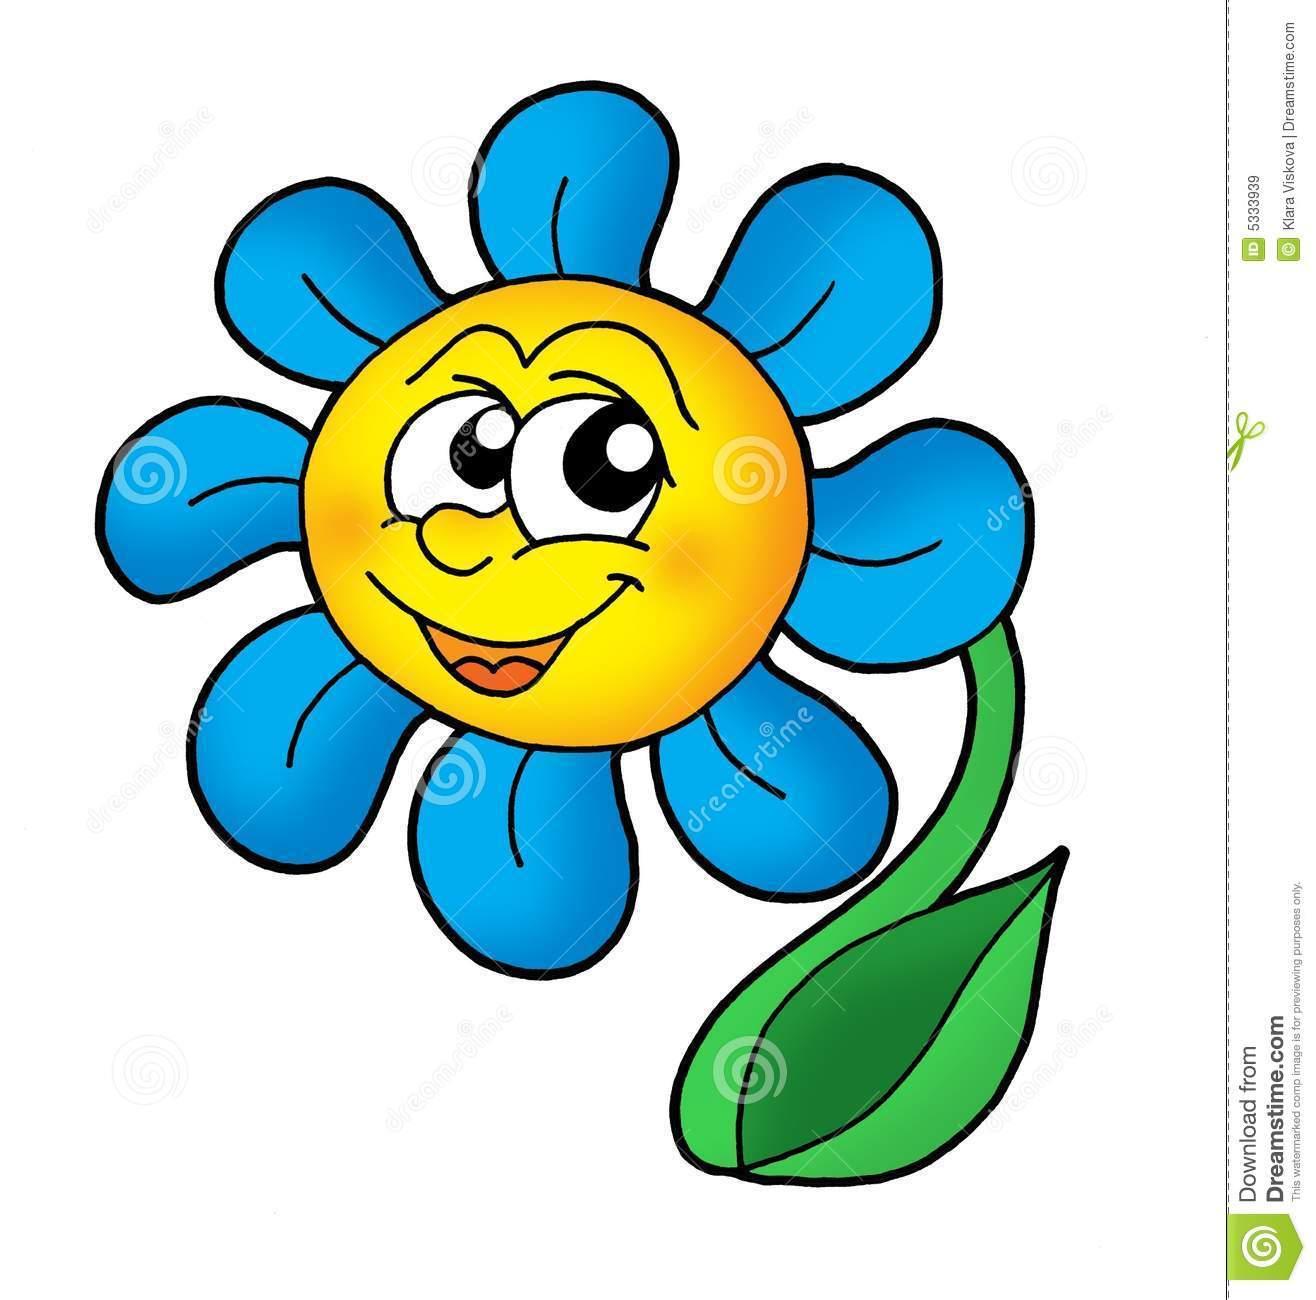 Smiling flower clipart 5 » Clipart Portal.